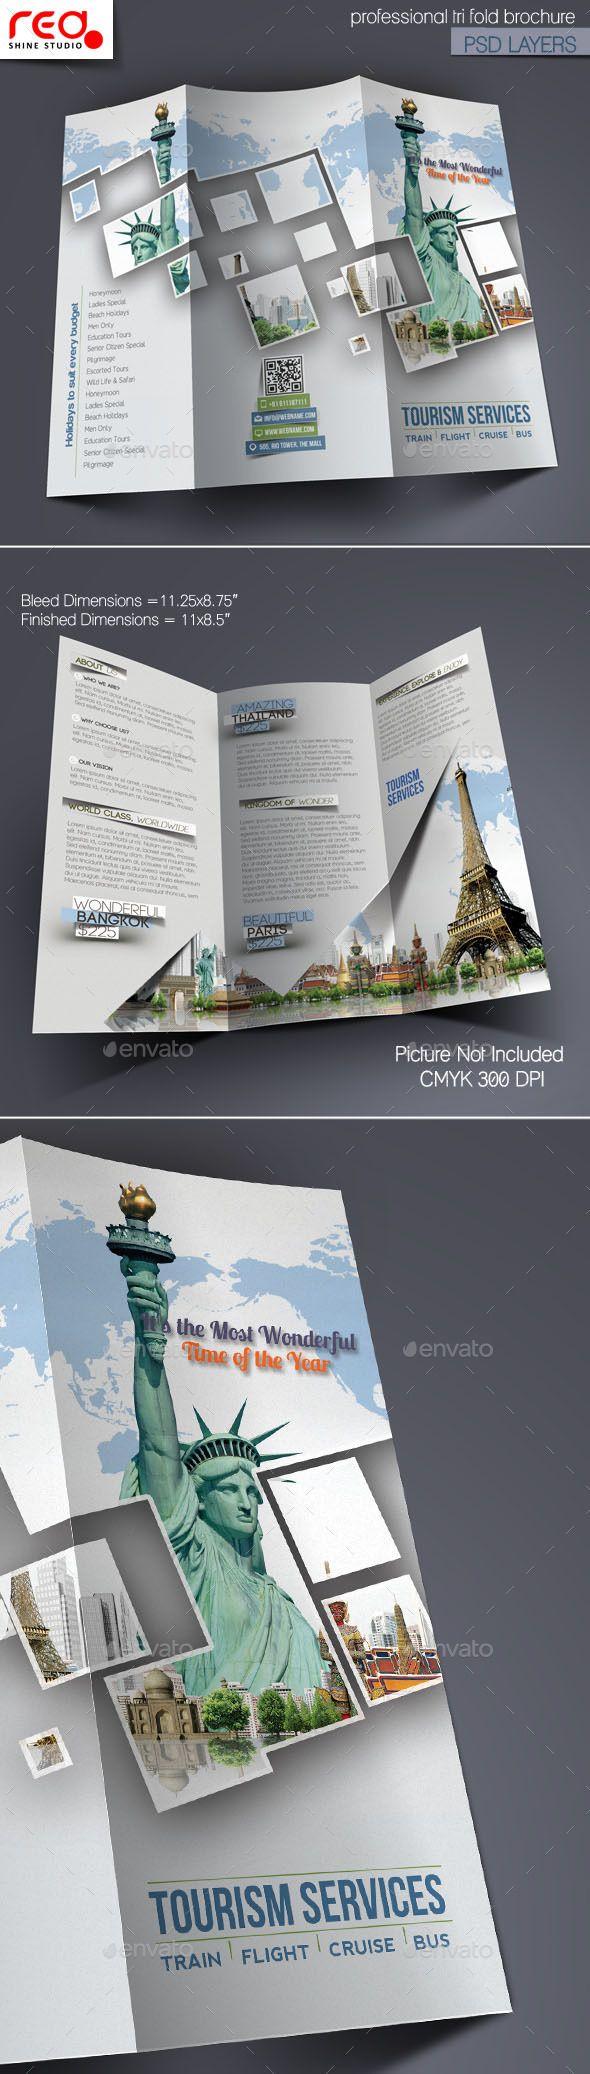 tourism service trifold brochure template  cs  8 5x11  ad